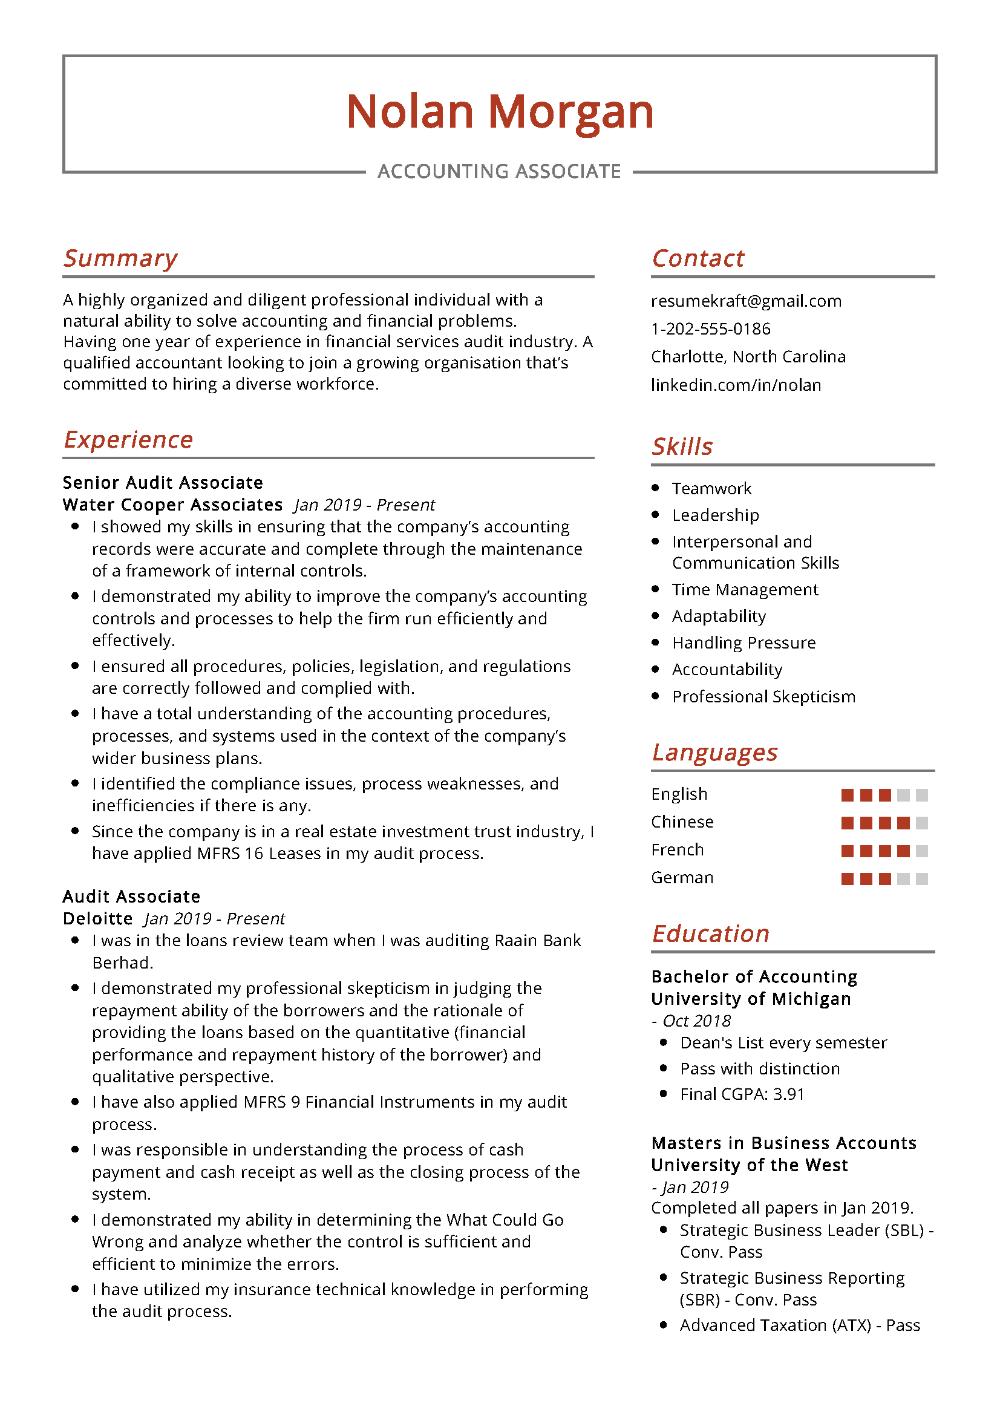 100 Professional Resume Samples For 2020 Resumekraft Accountant Resume Professional Resume Samples Resume